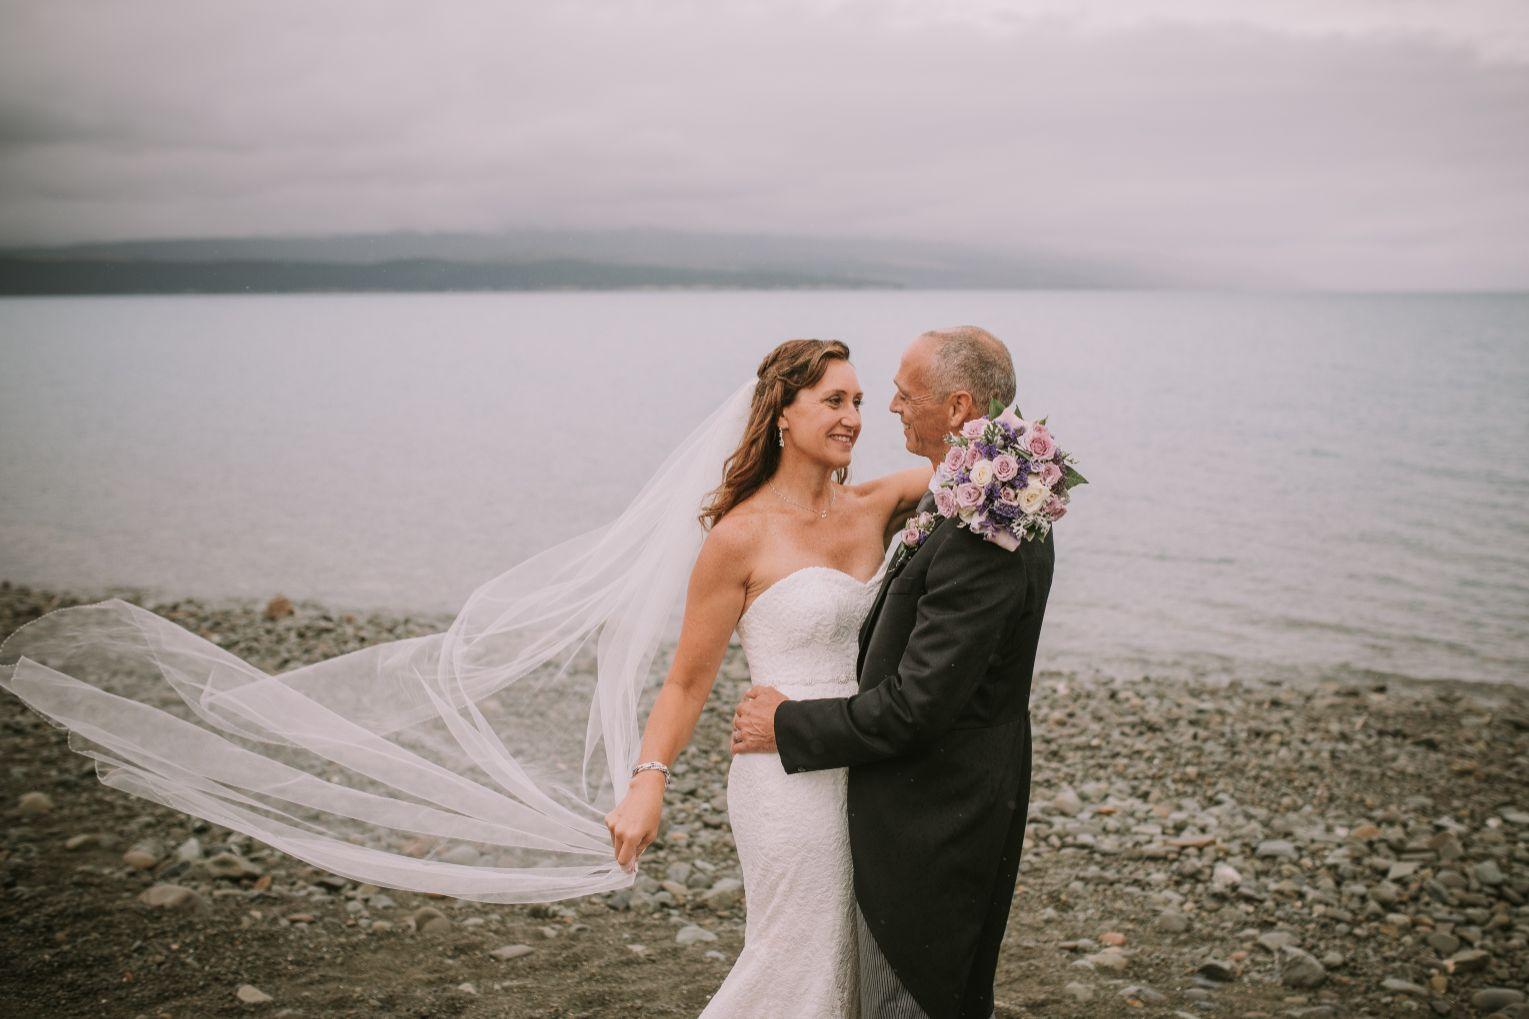 wedding photos at mt cook lakeside retreat